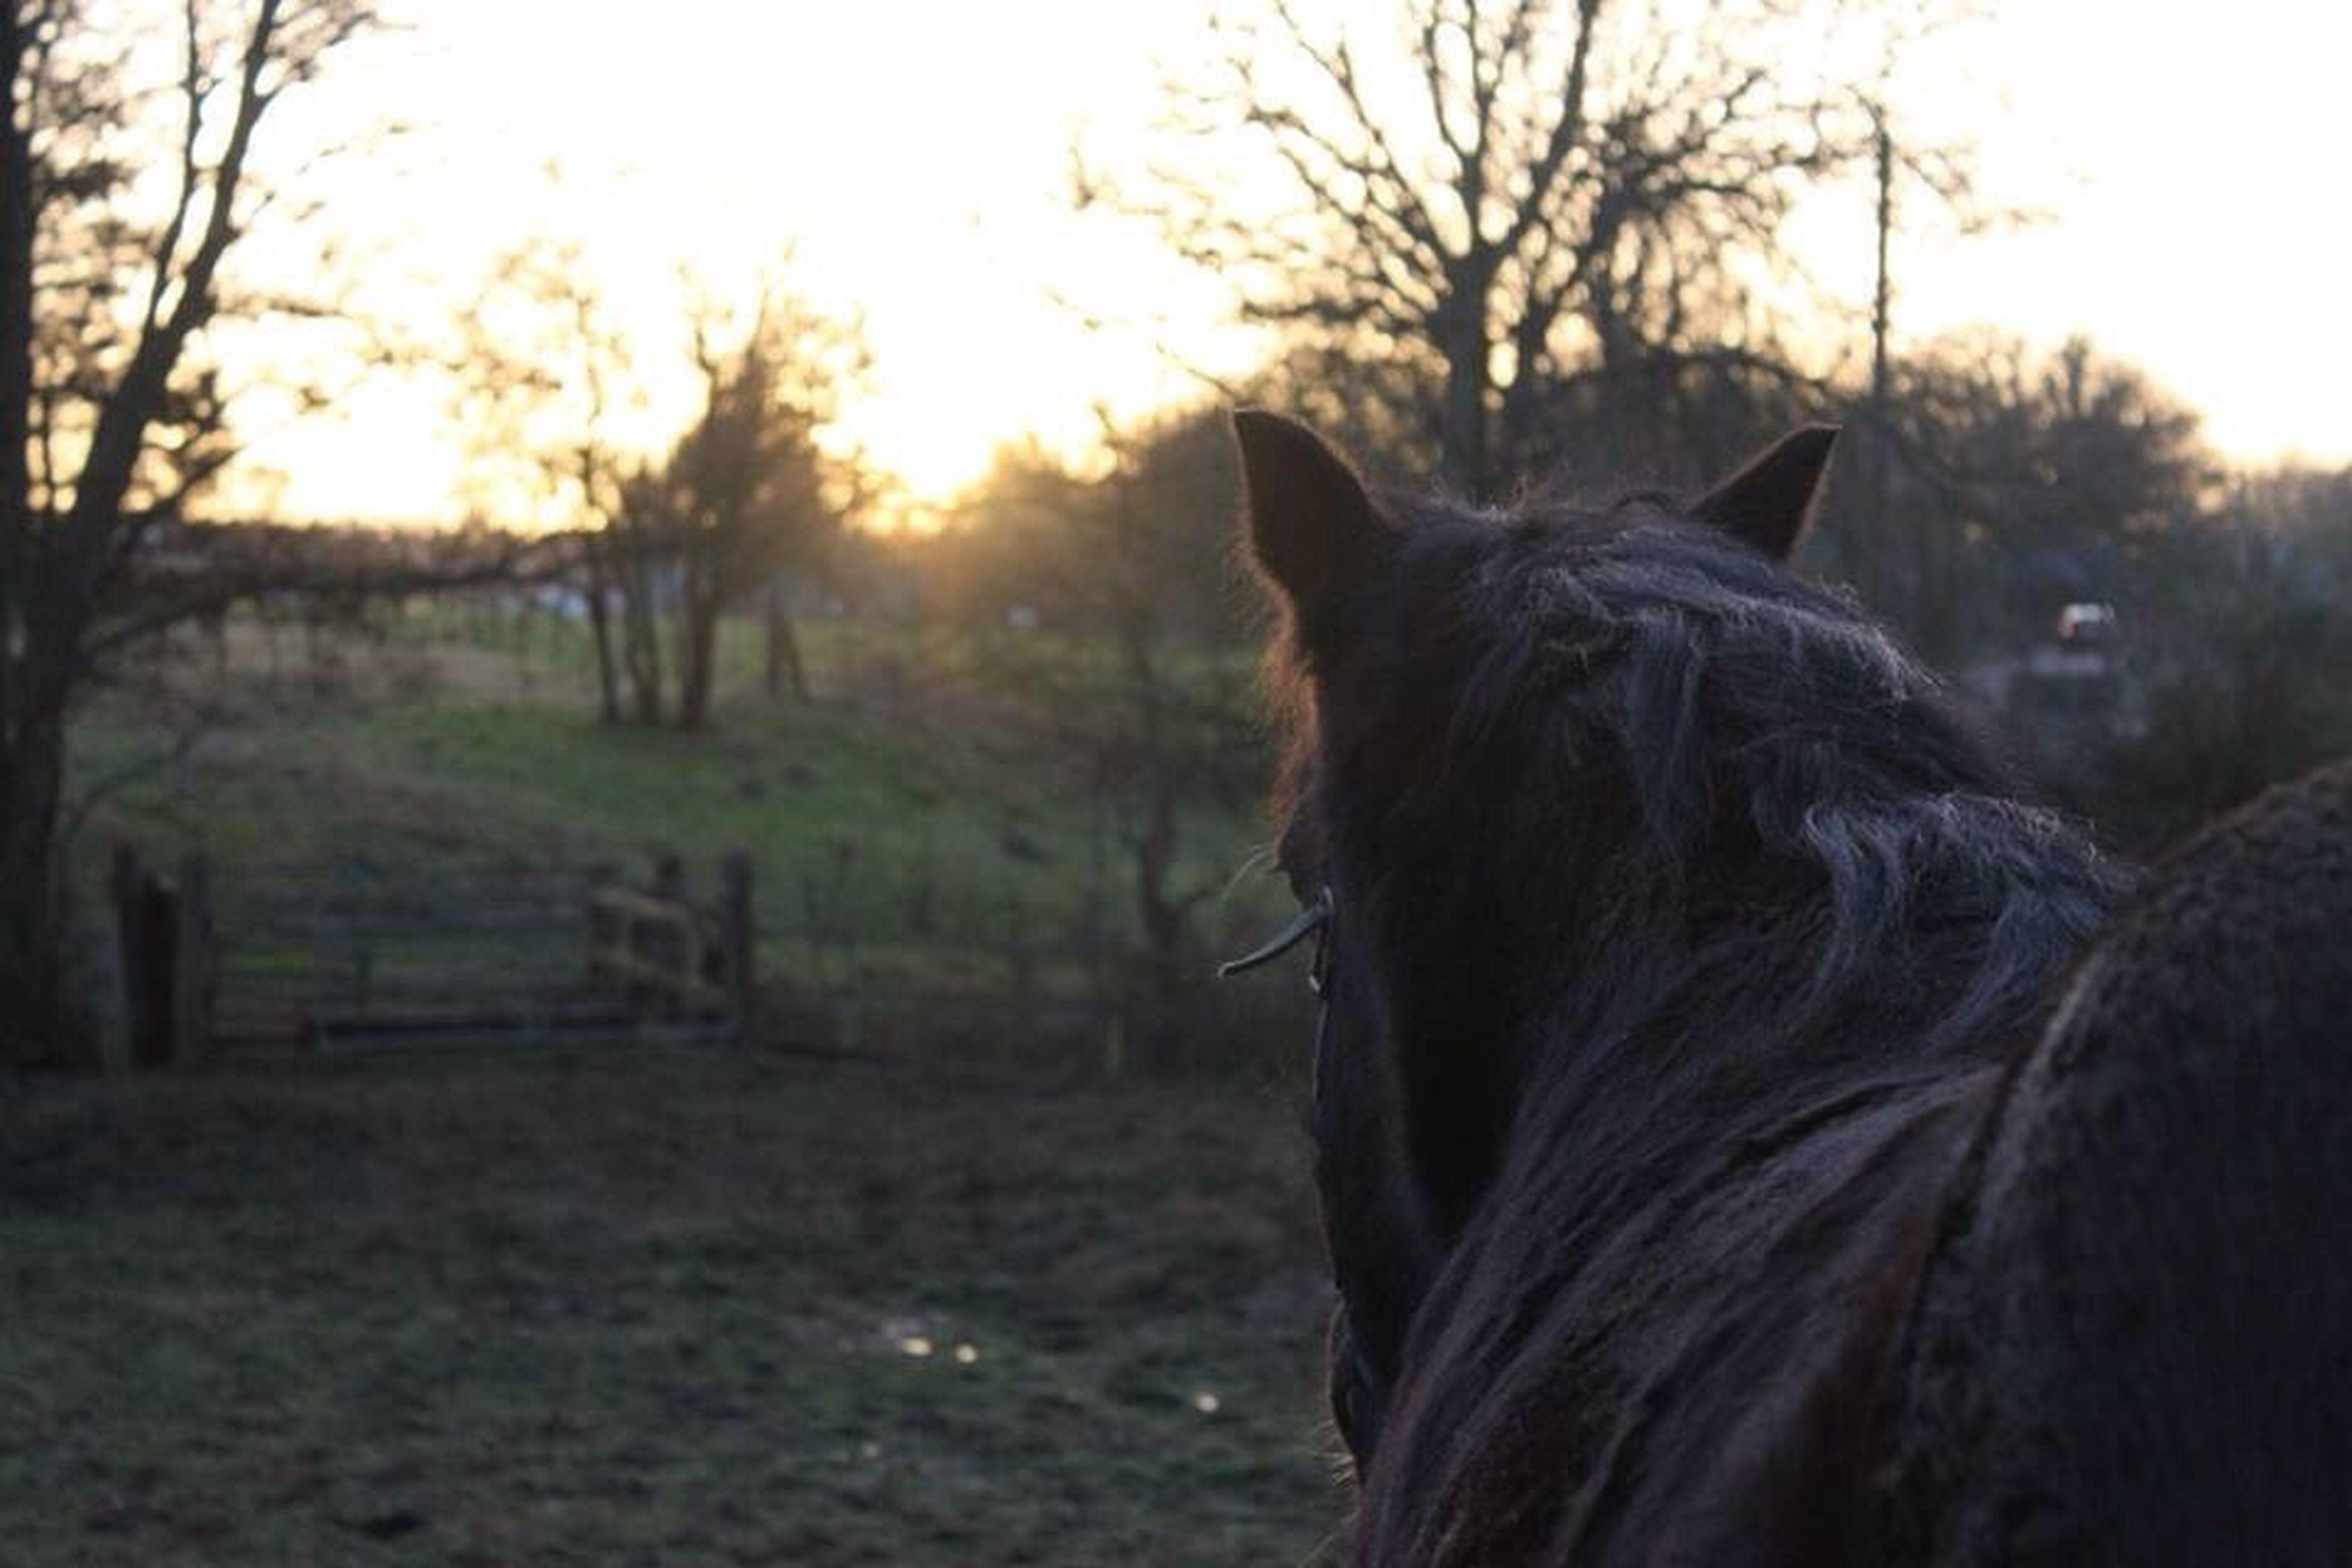 animal themes, domestic animals, mammal, horse, field, sunset, livestock, tree, one animal, landscape, grass, nature, rural scene, fence, sky, grassy, tranquility, tranquil scene, herbivorous, standing